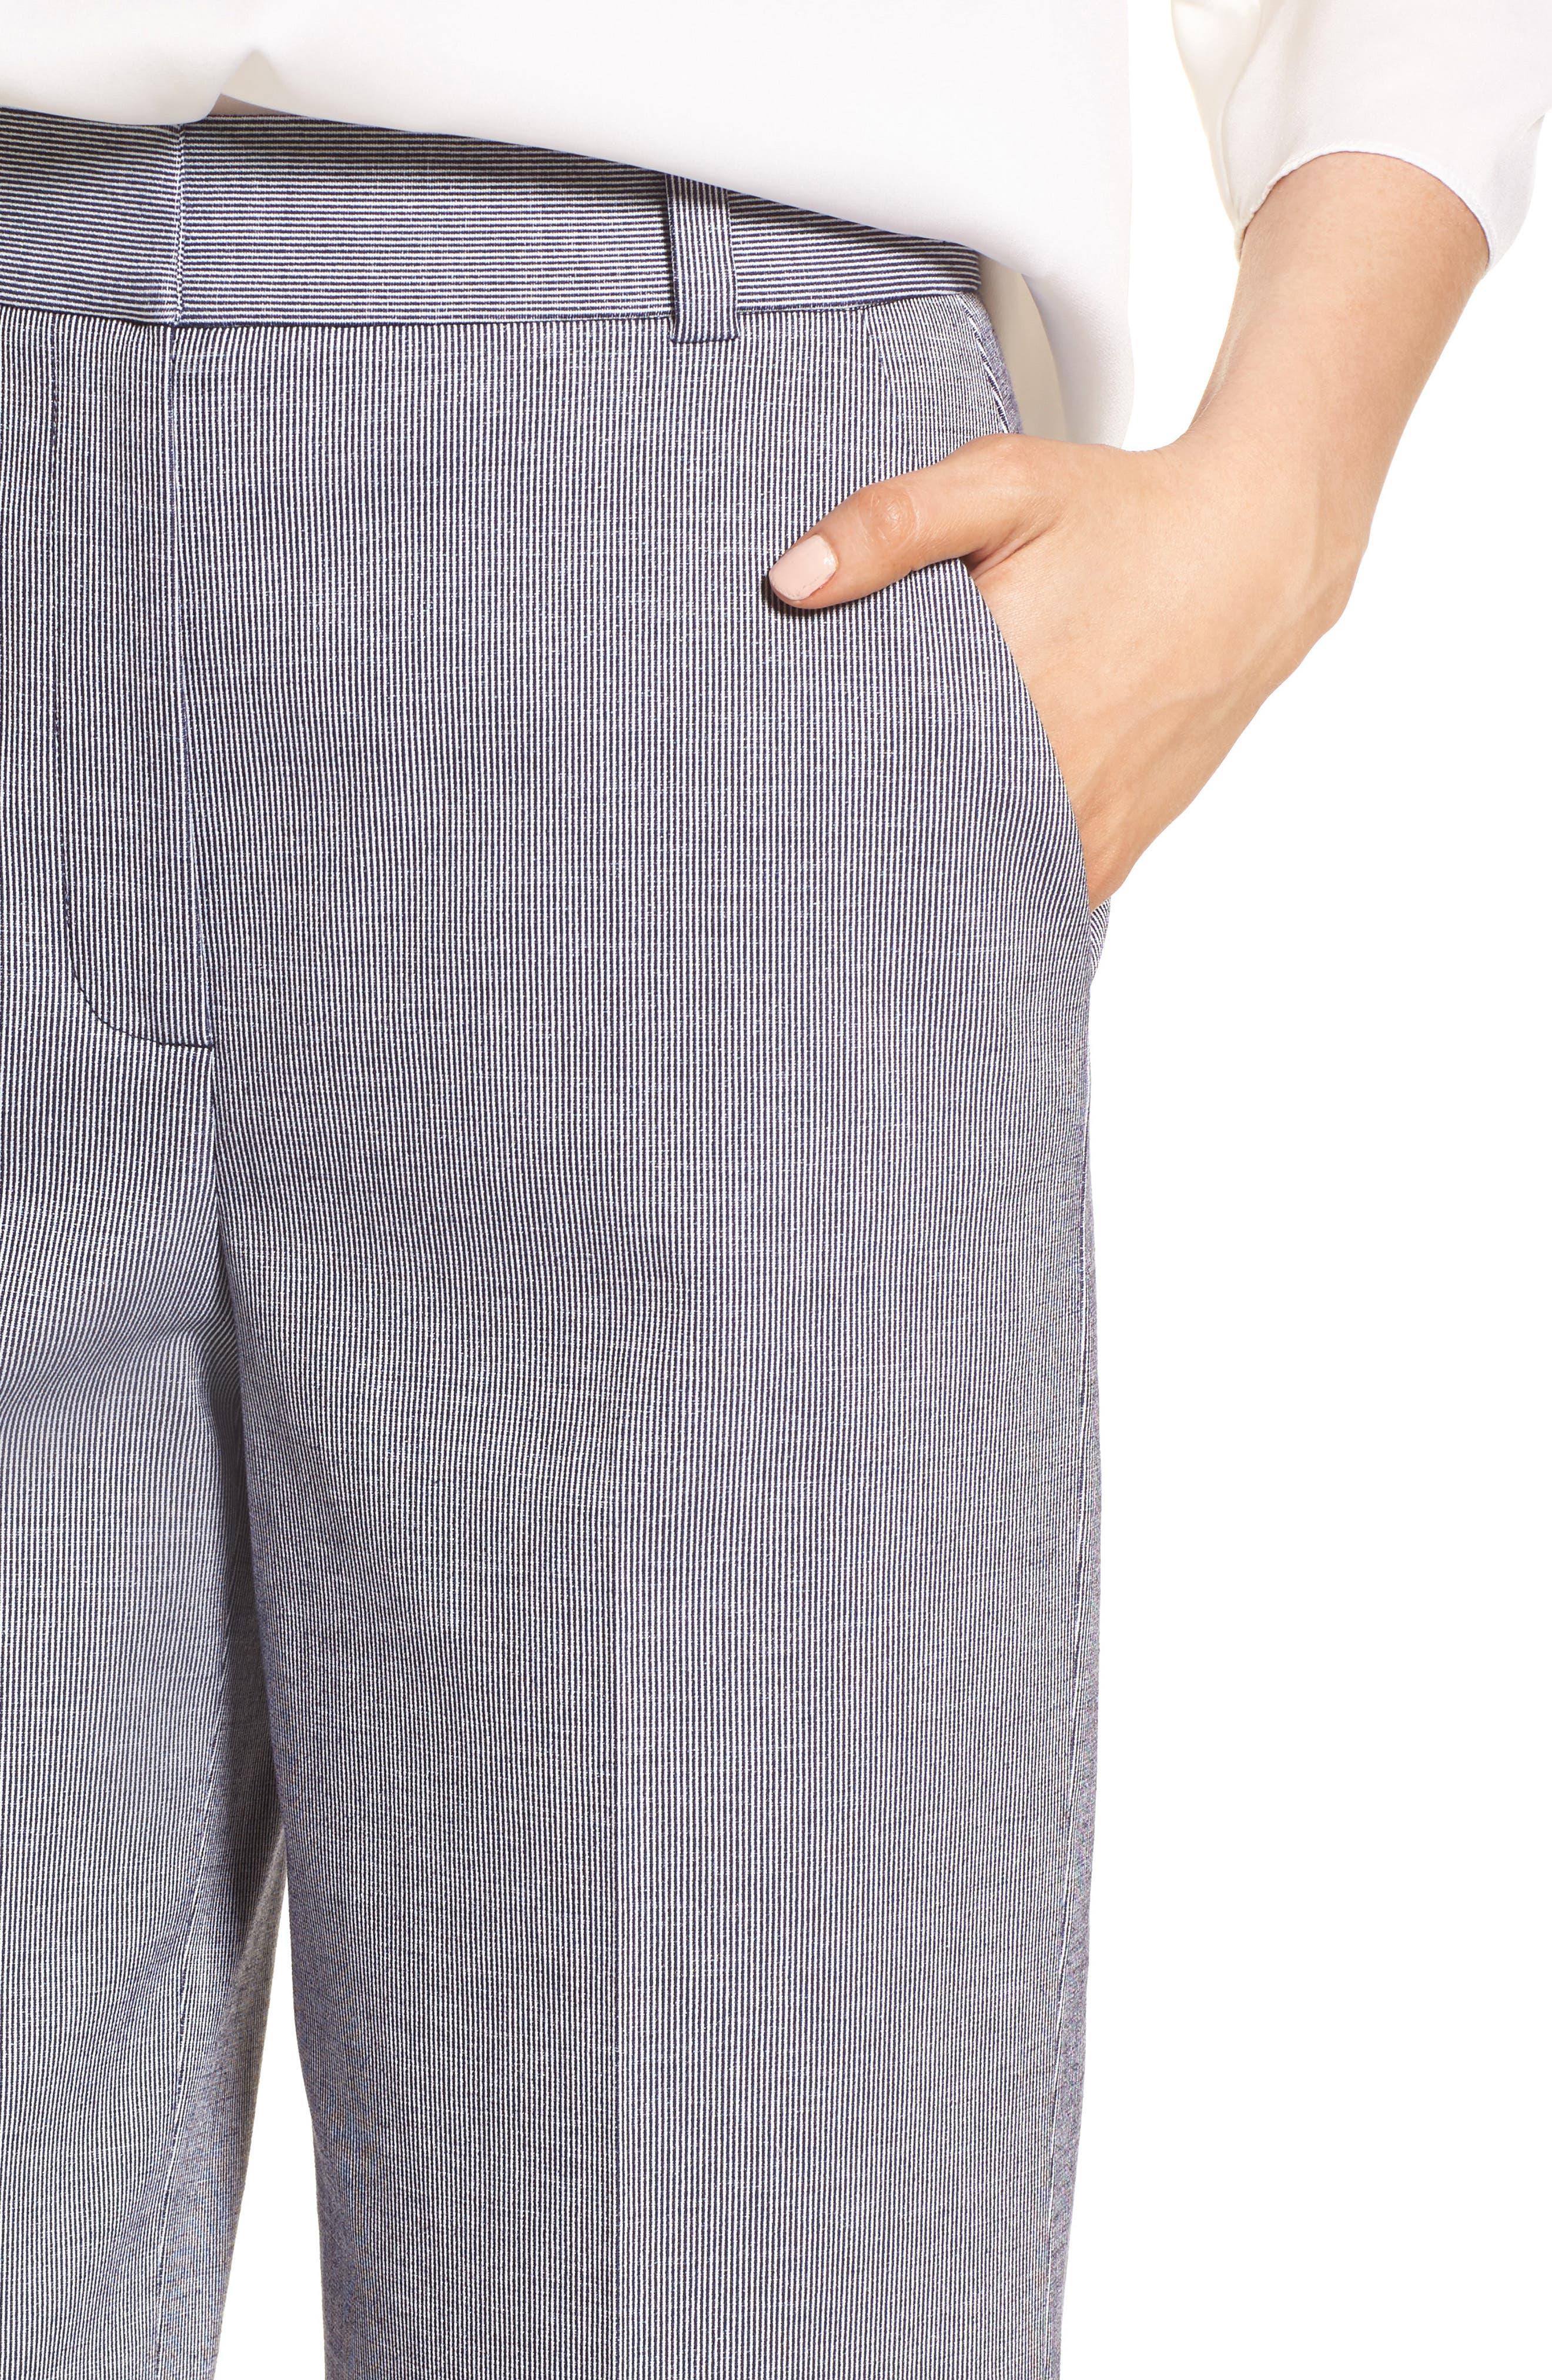 Ticking Stripe Pants,                             Alternate thumbnail 4, color,                             401